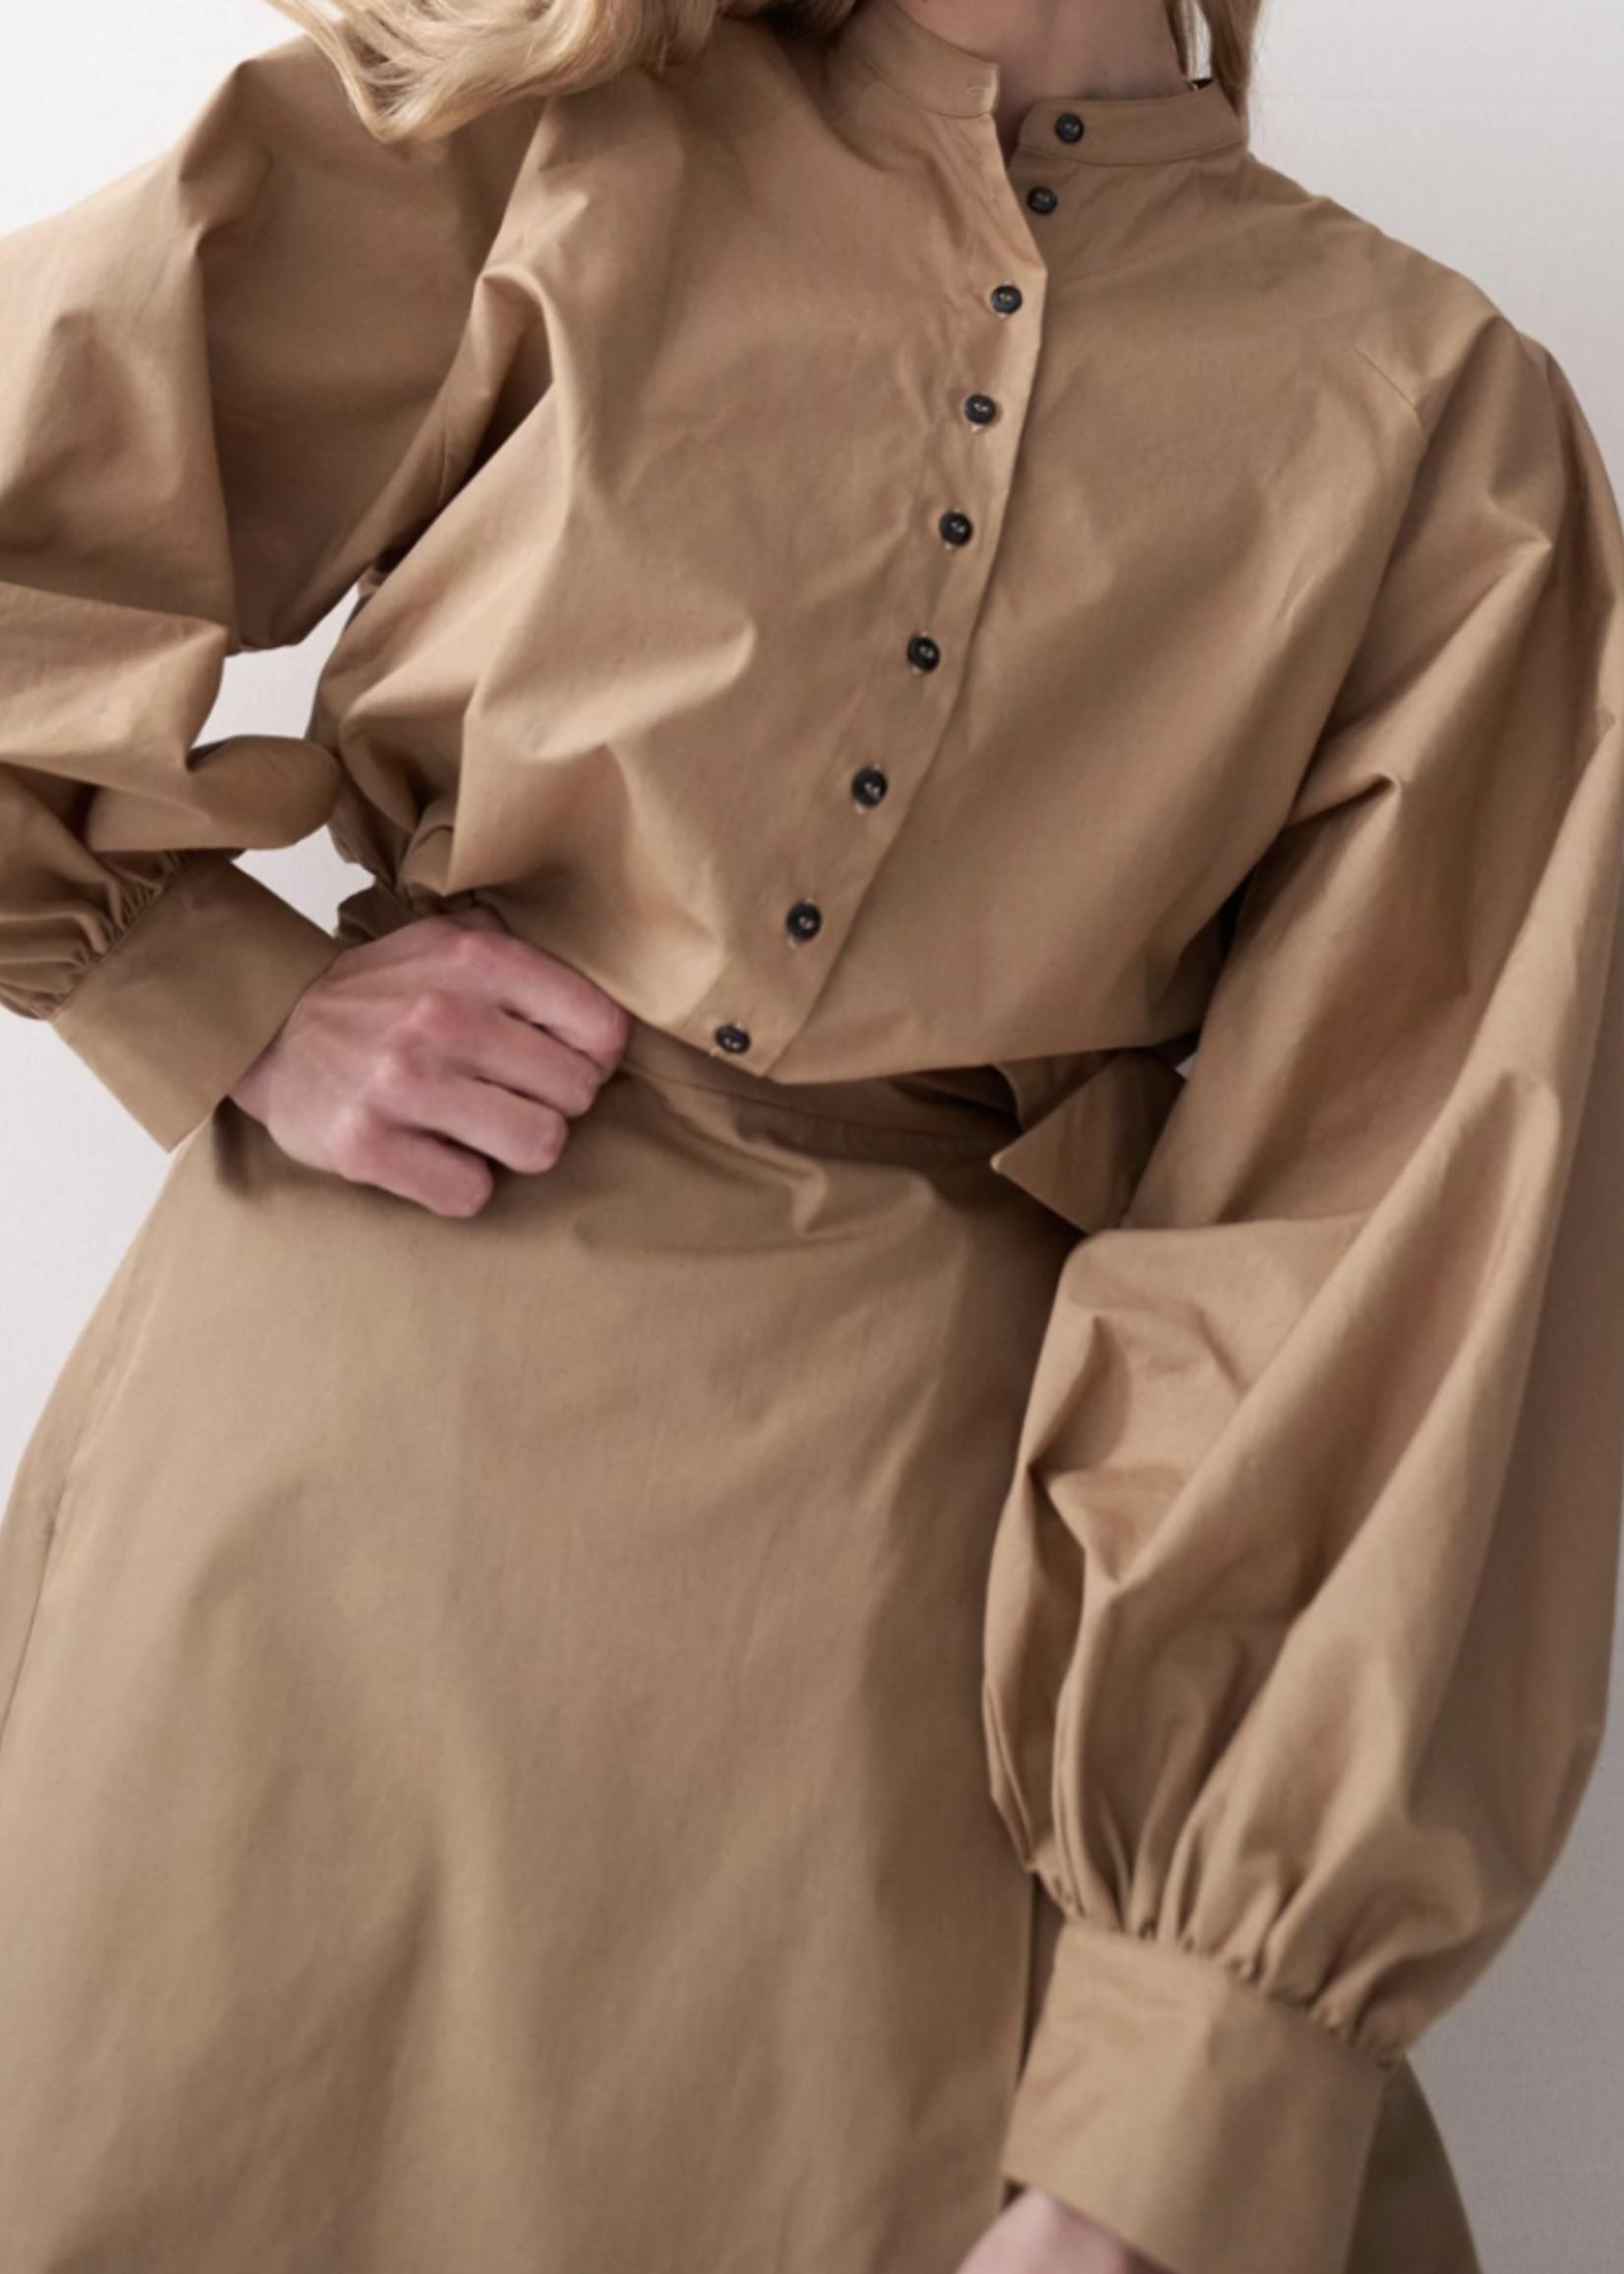 rikastudios Rika Studios joan shirt cotton khaki